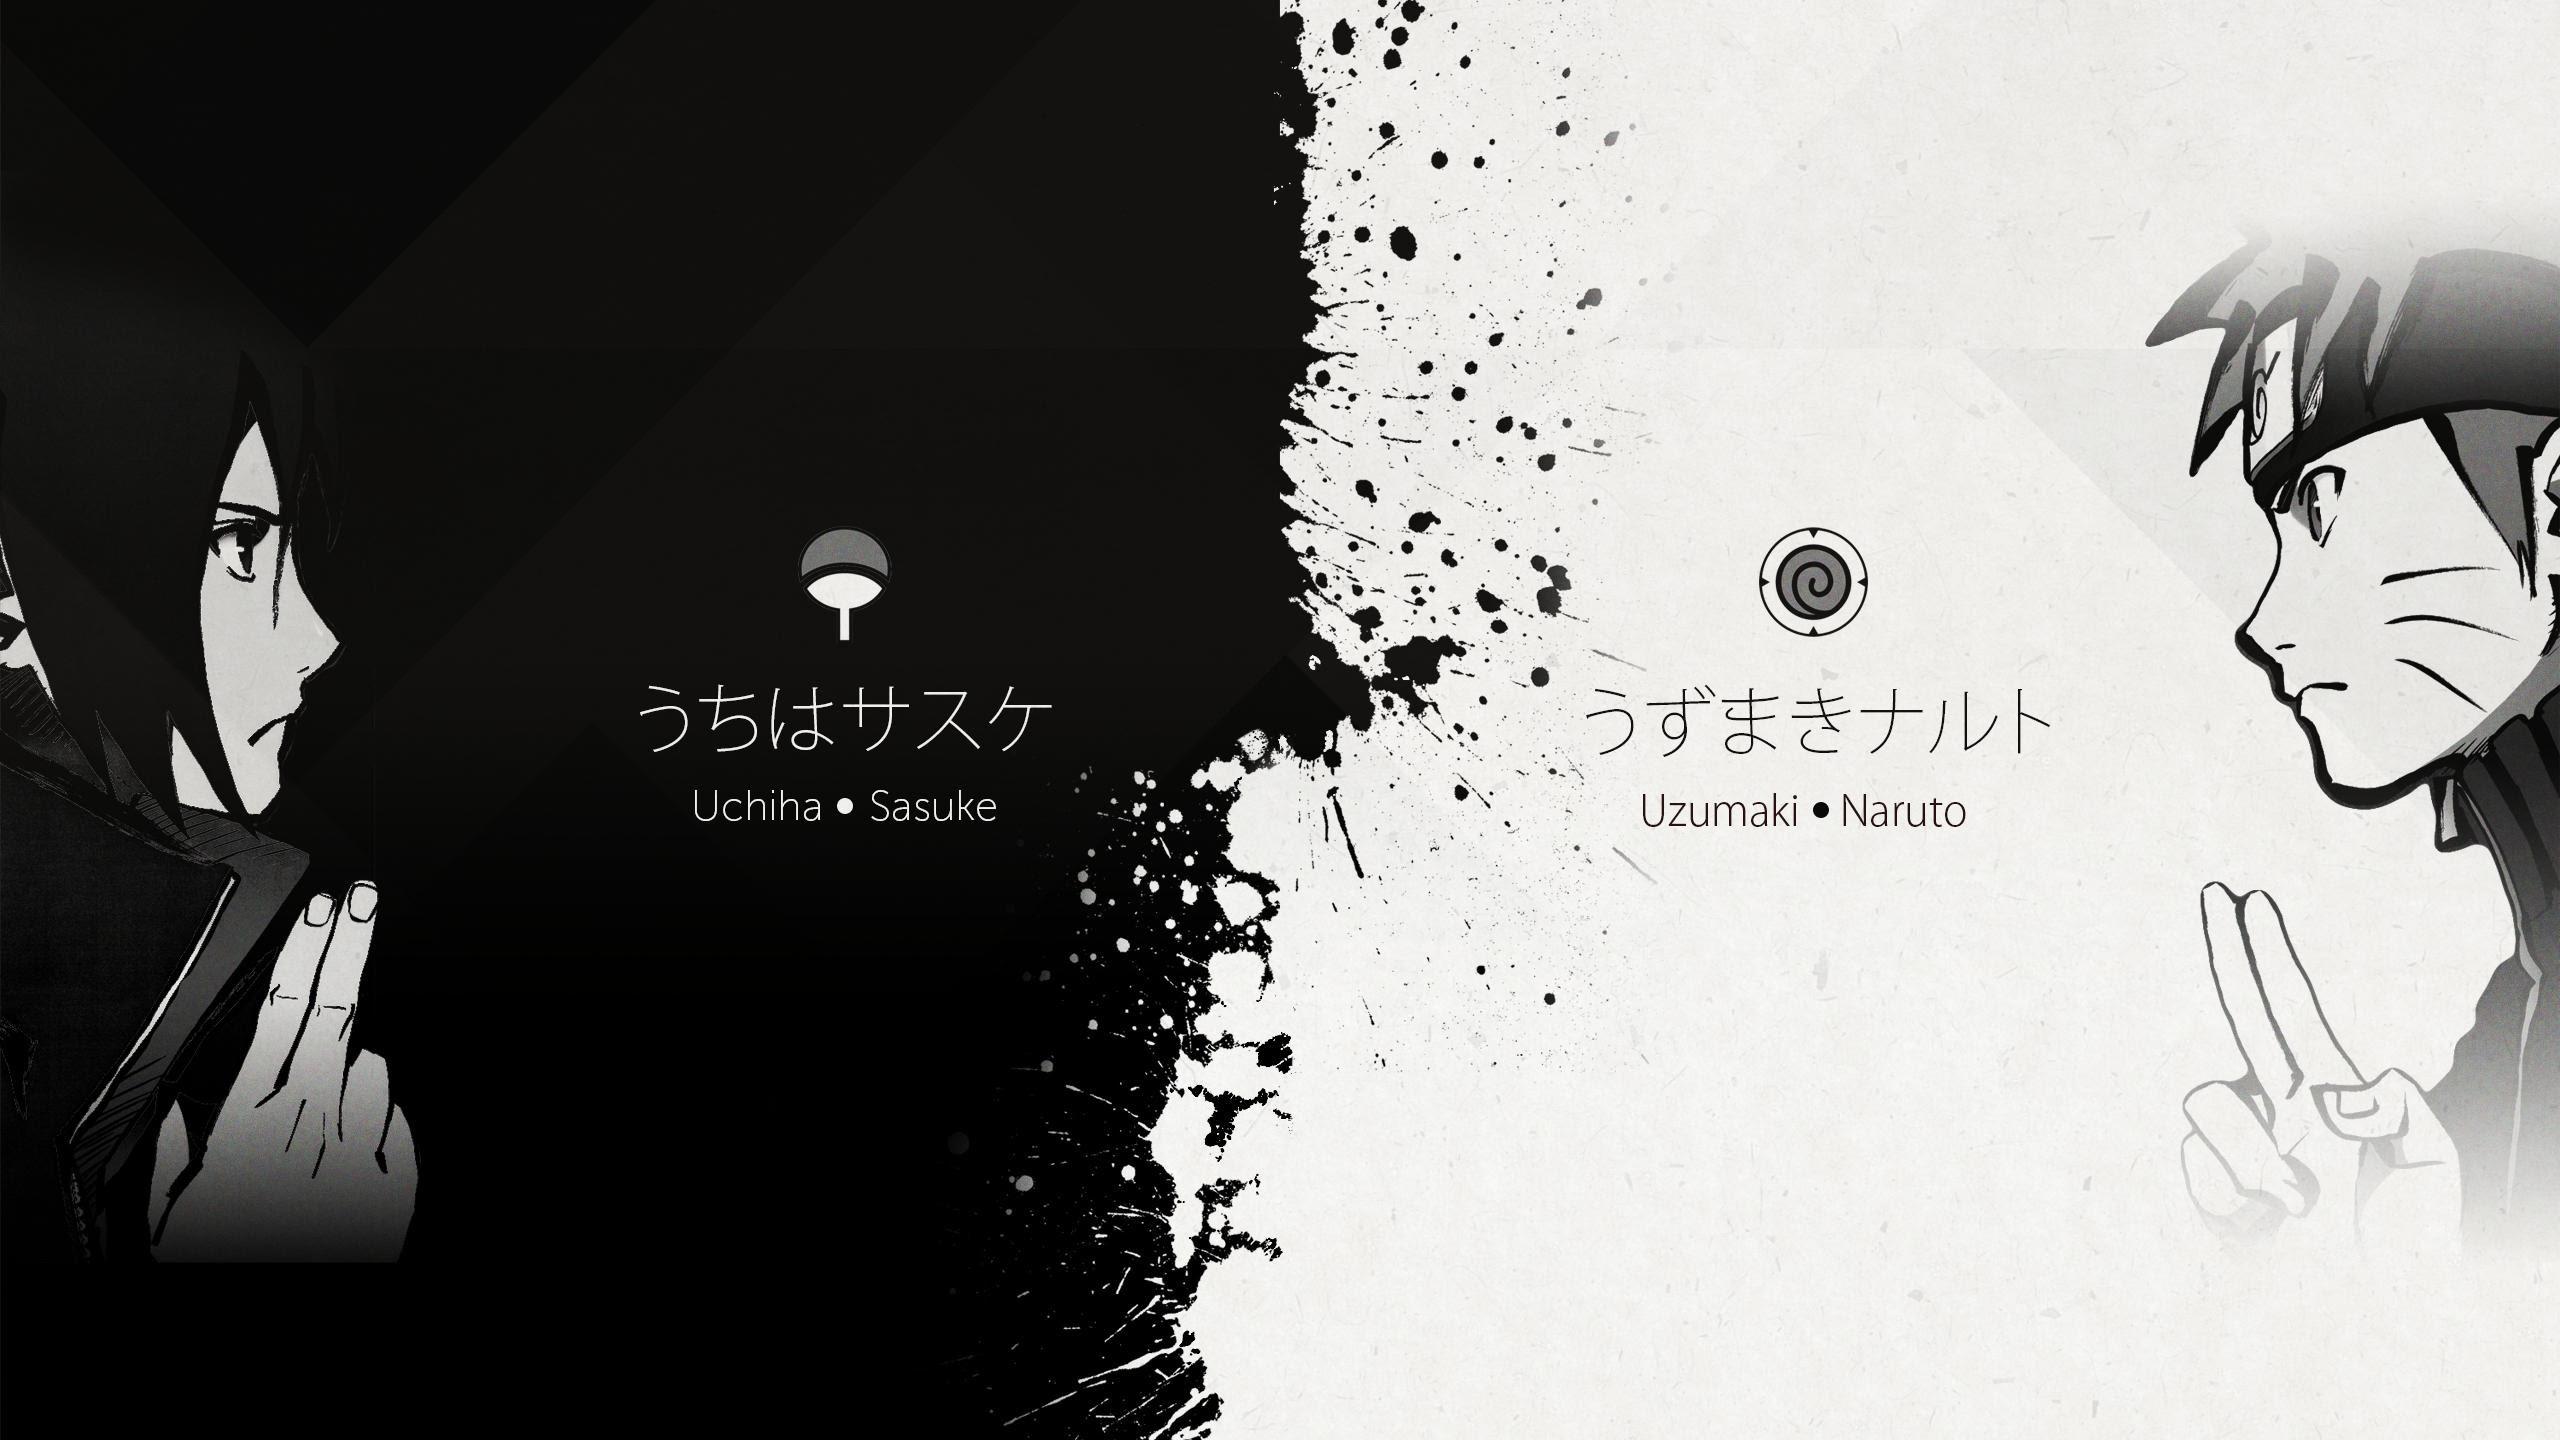 Download 48+ Wallpaper Engine Naruto Vs Sasuke HD Terbaik